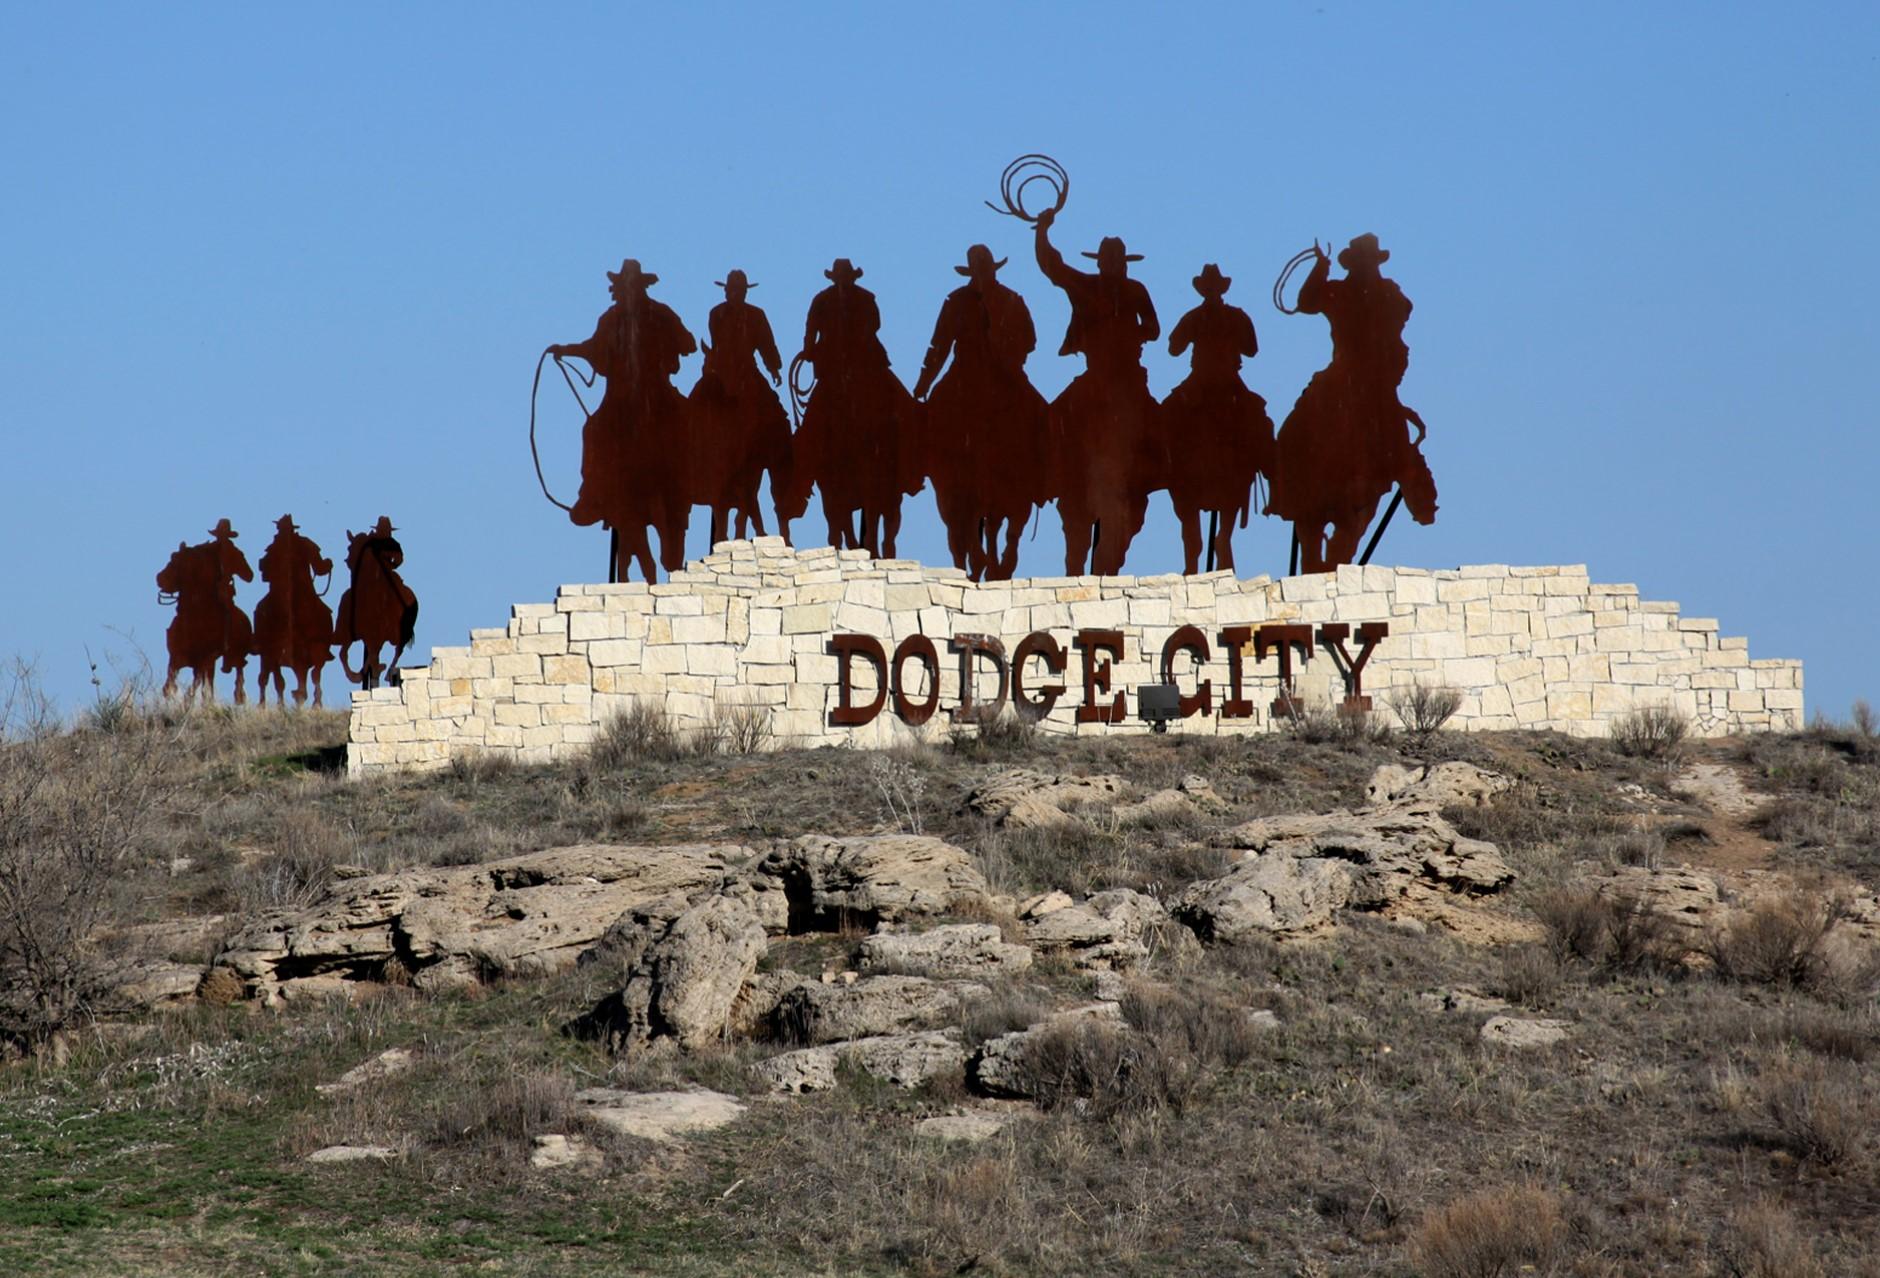 Dodge City Cowboys.jpg